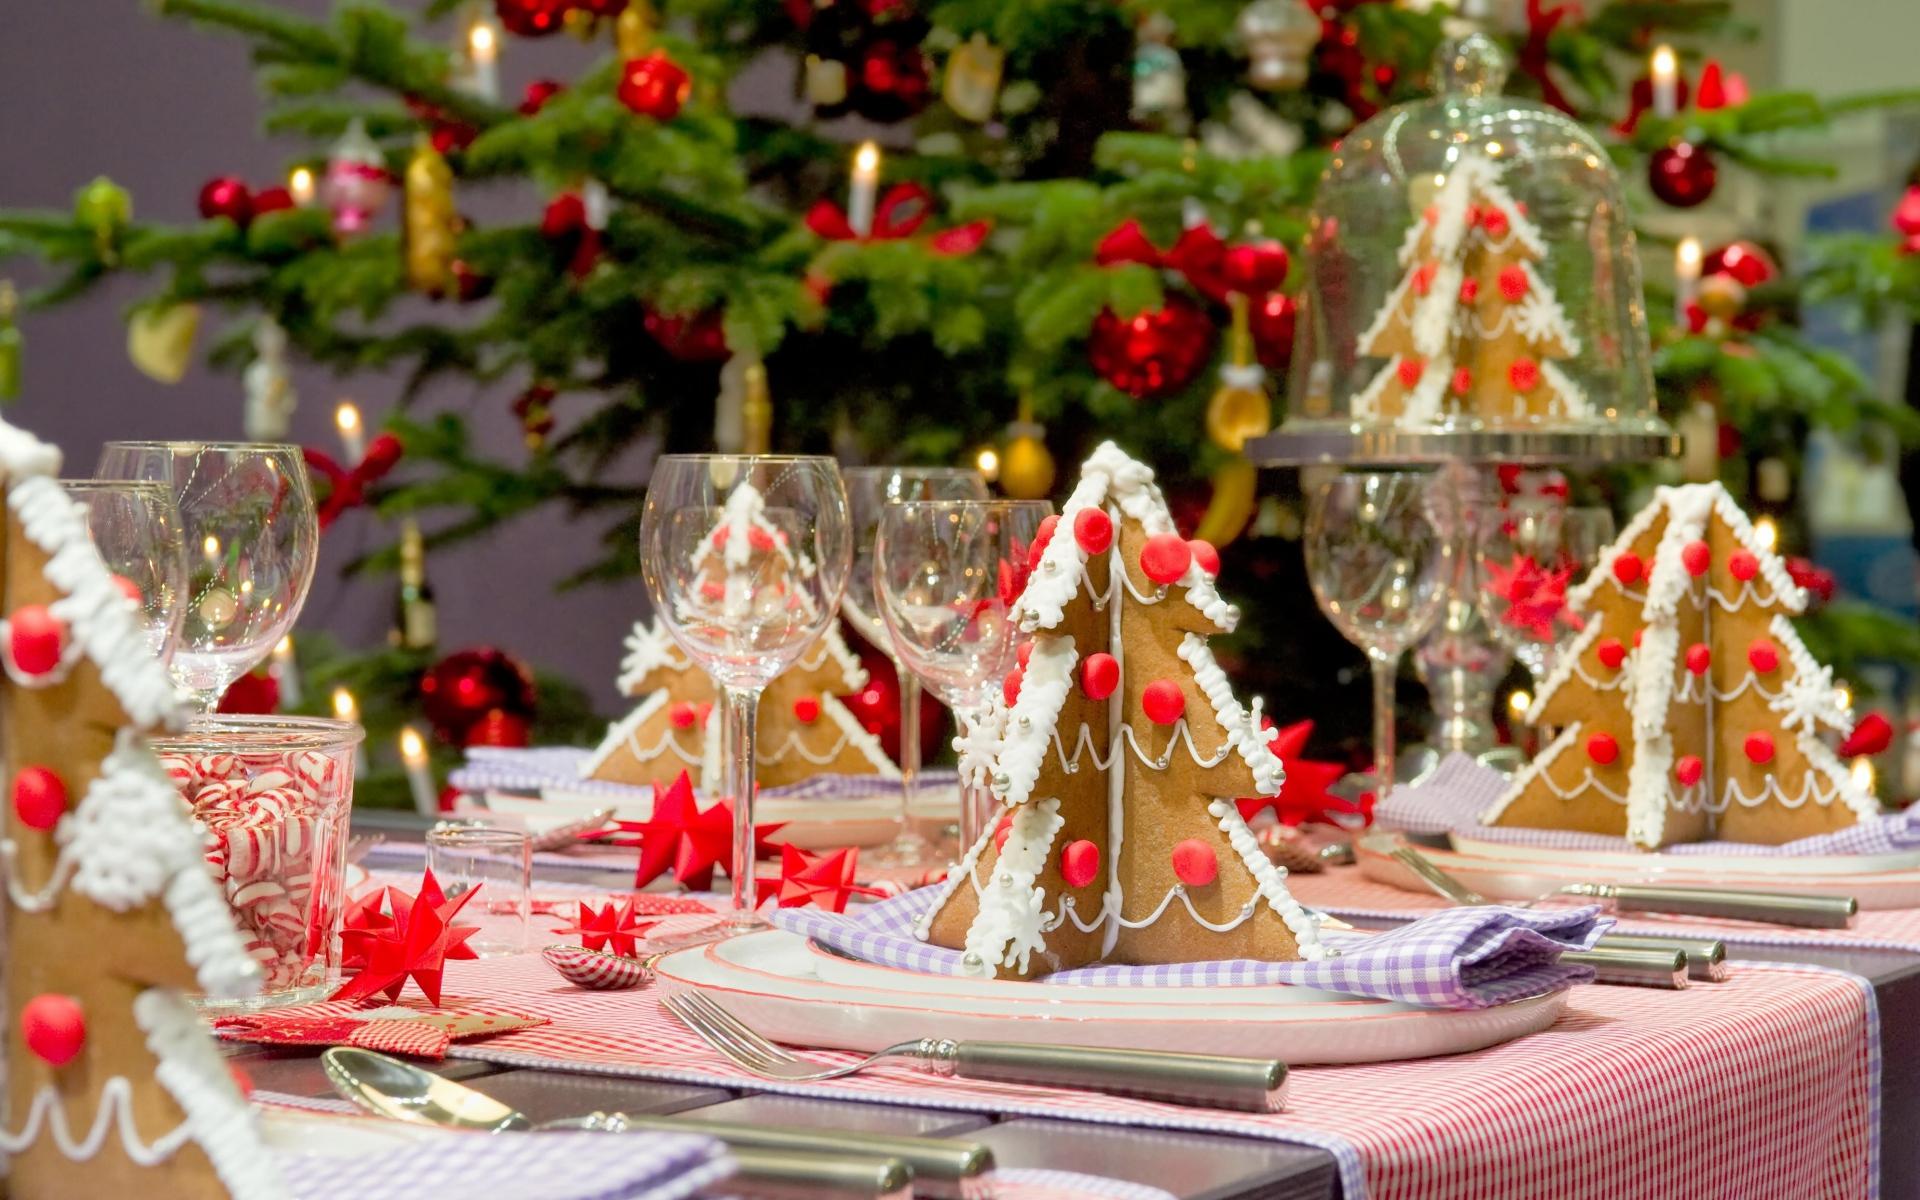 christmas-treats-and-smiles-wallpaper